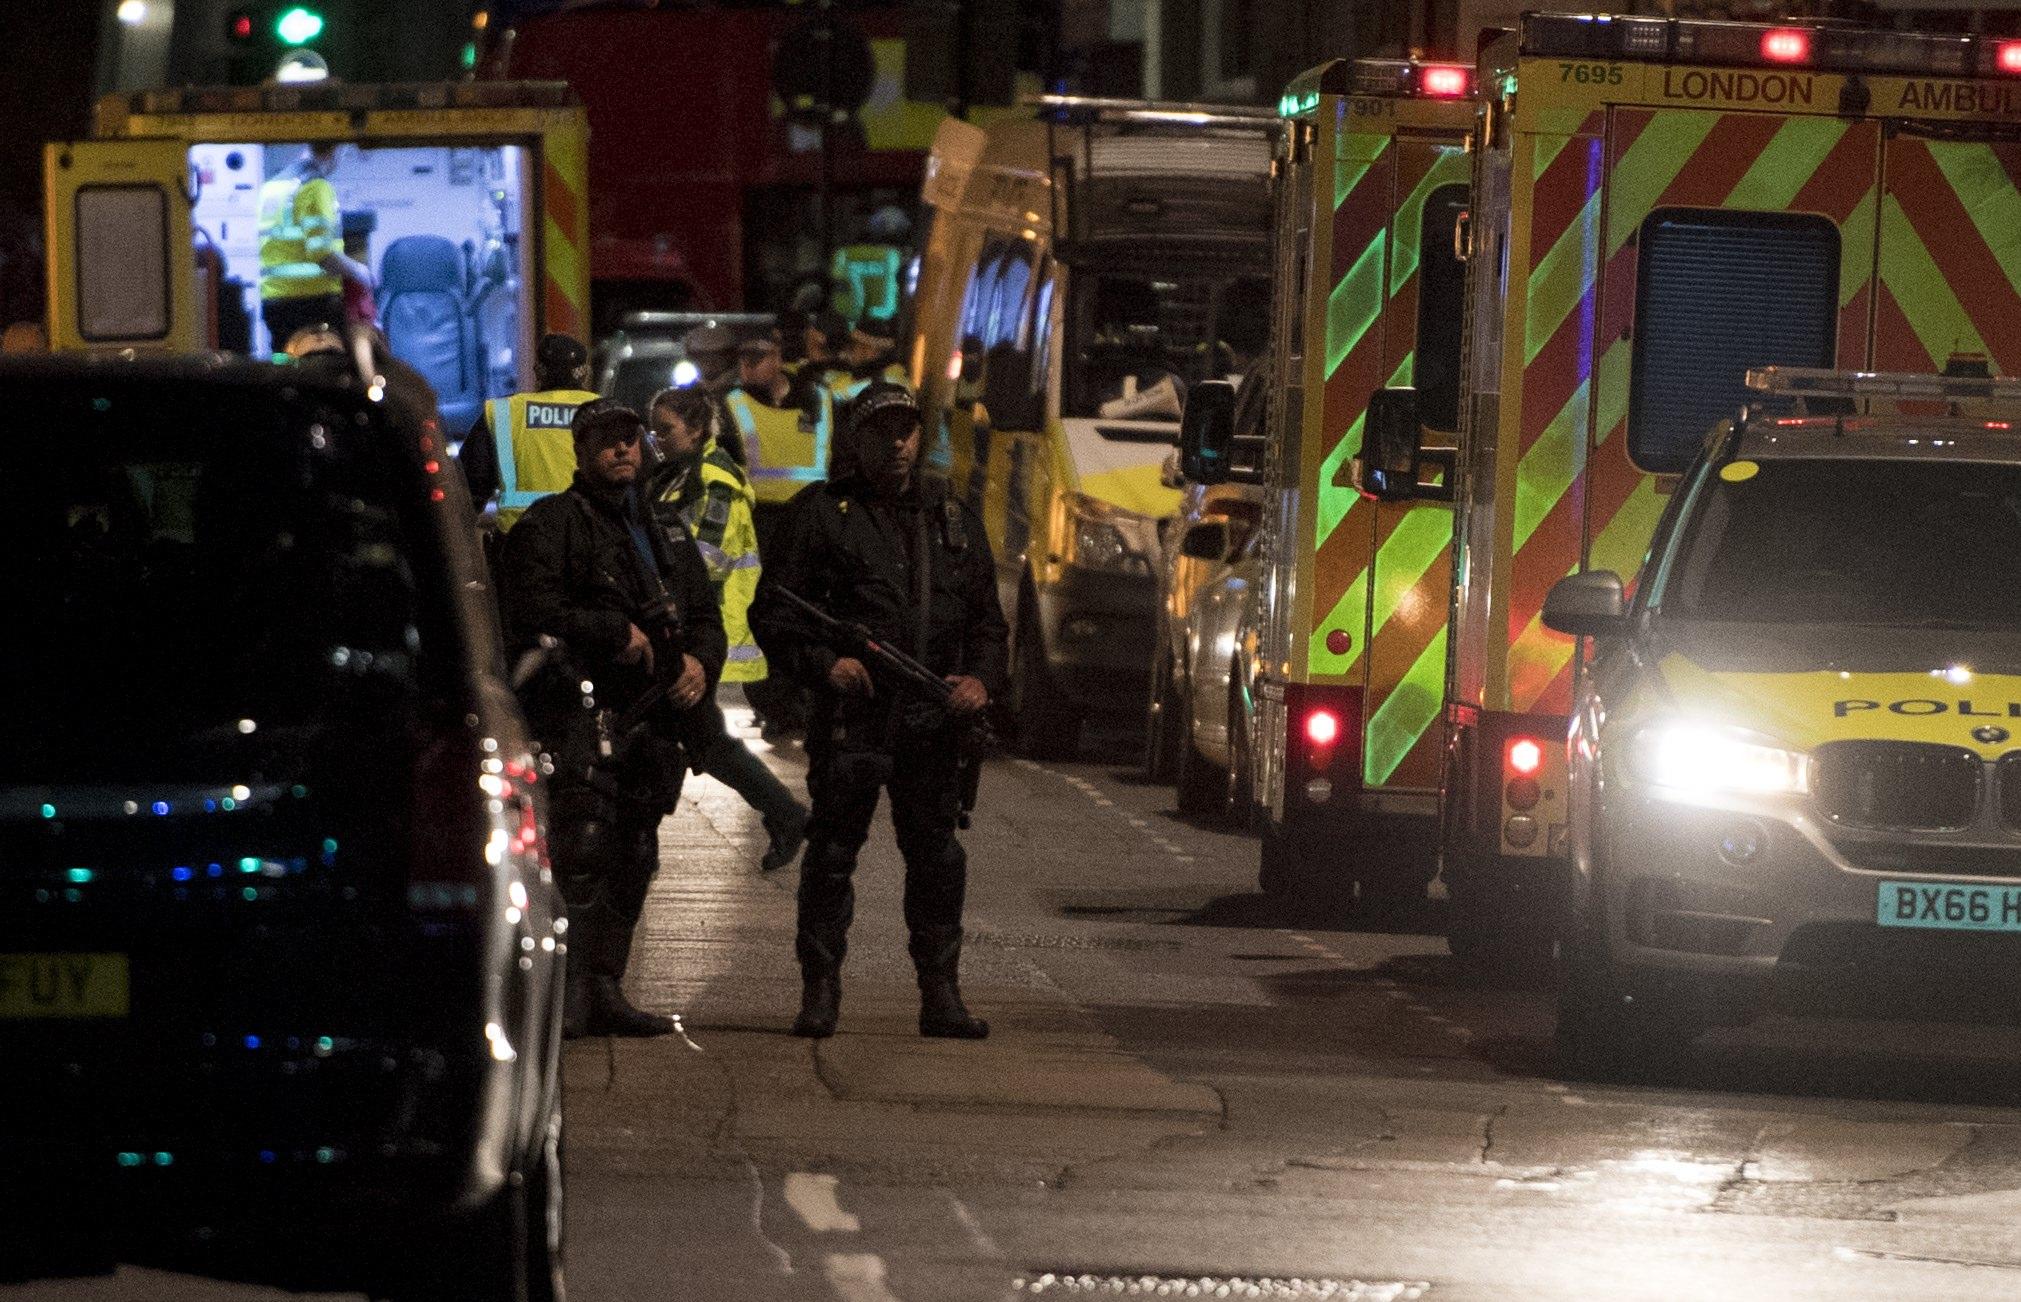 ataques terroristas em londres